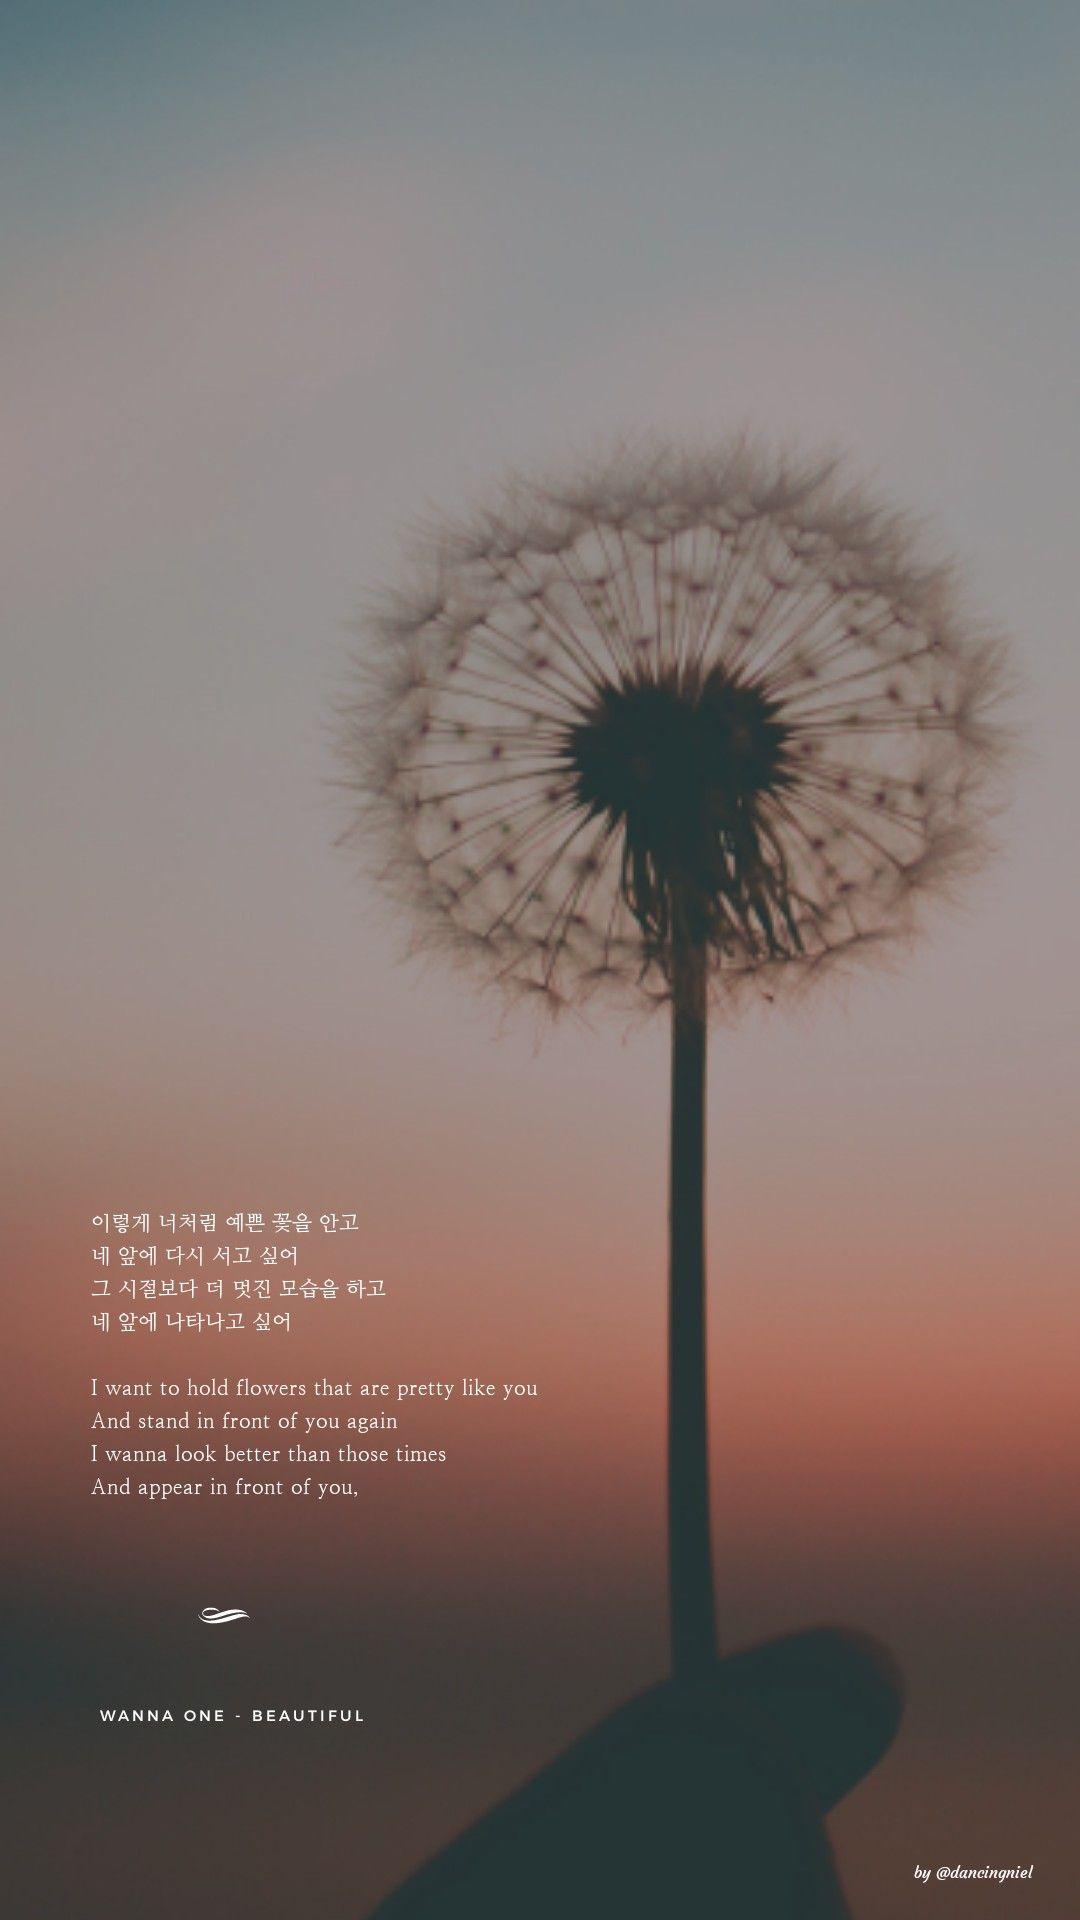 Wanna One Beautiful C Dancingniel Please Do Not Crop The Logo